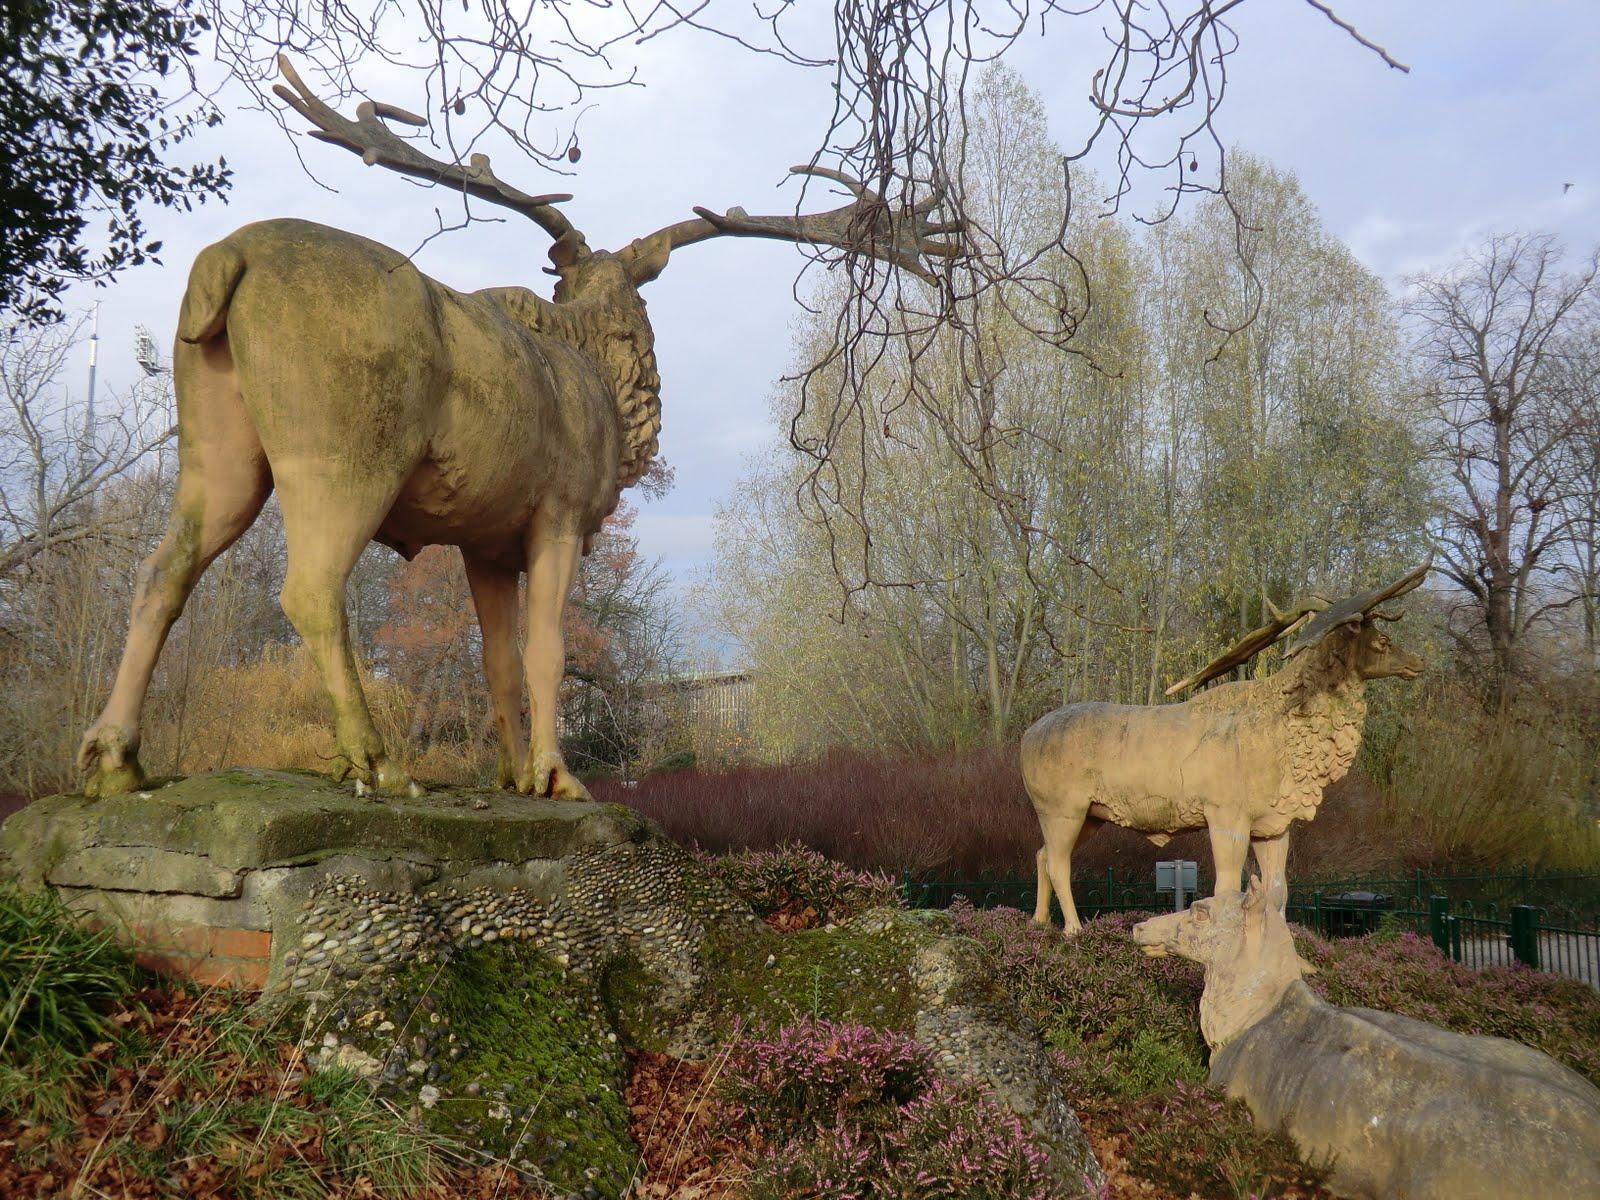 CIMG4971 Megaloceros, Crystal Palace Park